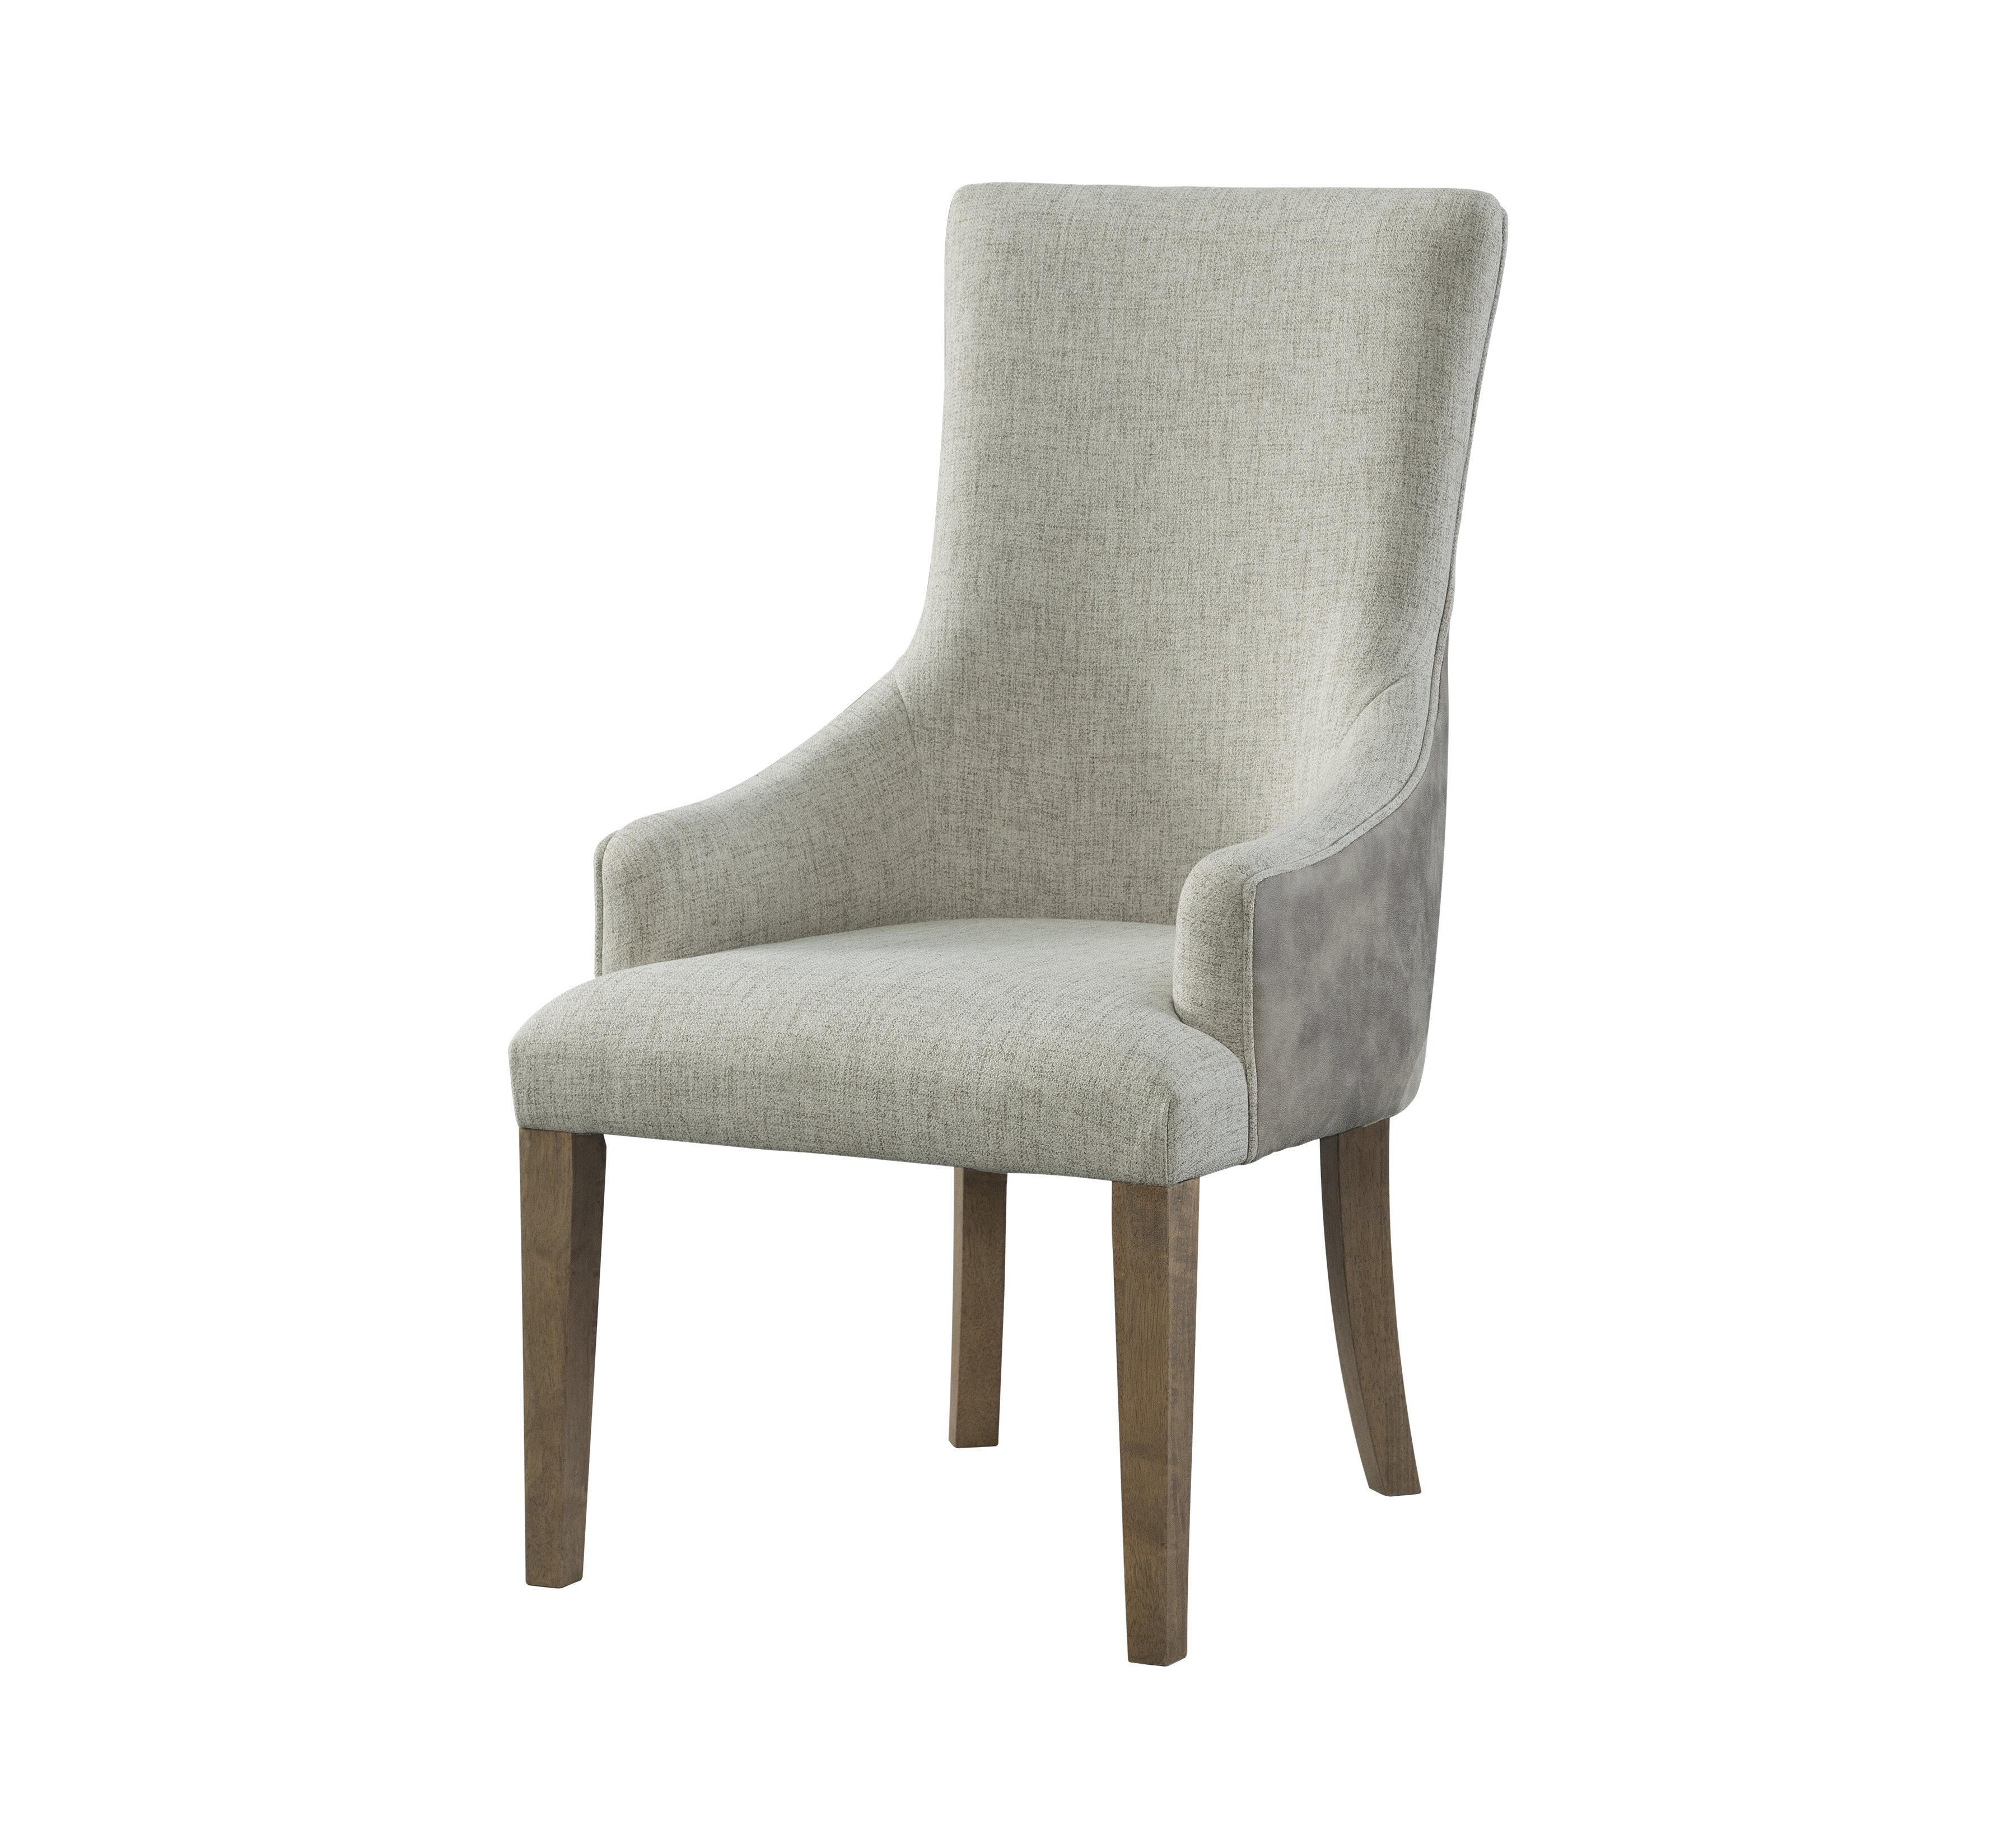 Gracie Oaks Schwenk Upholstered Dining Chair Wayfair